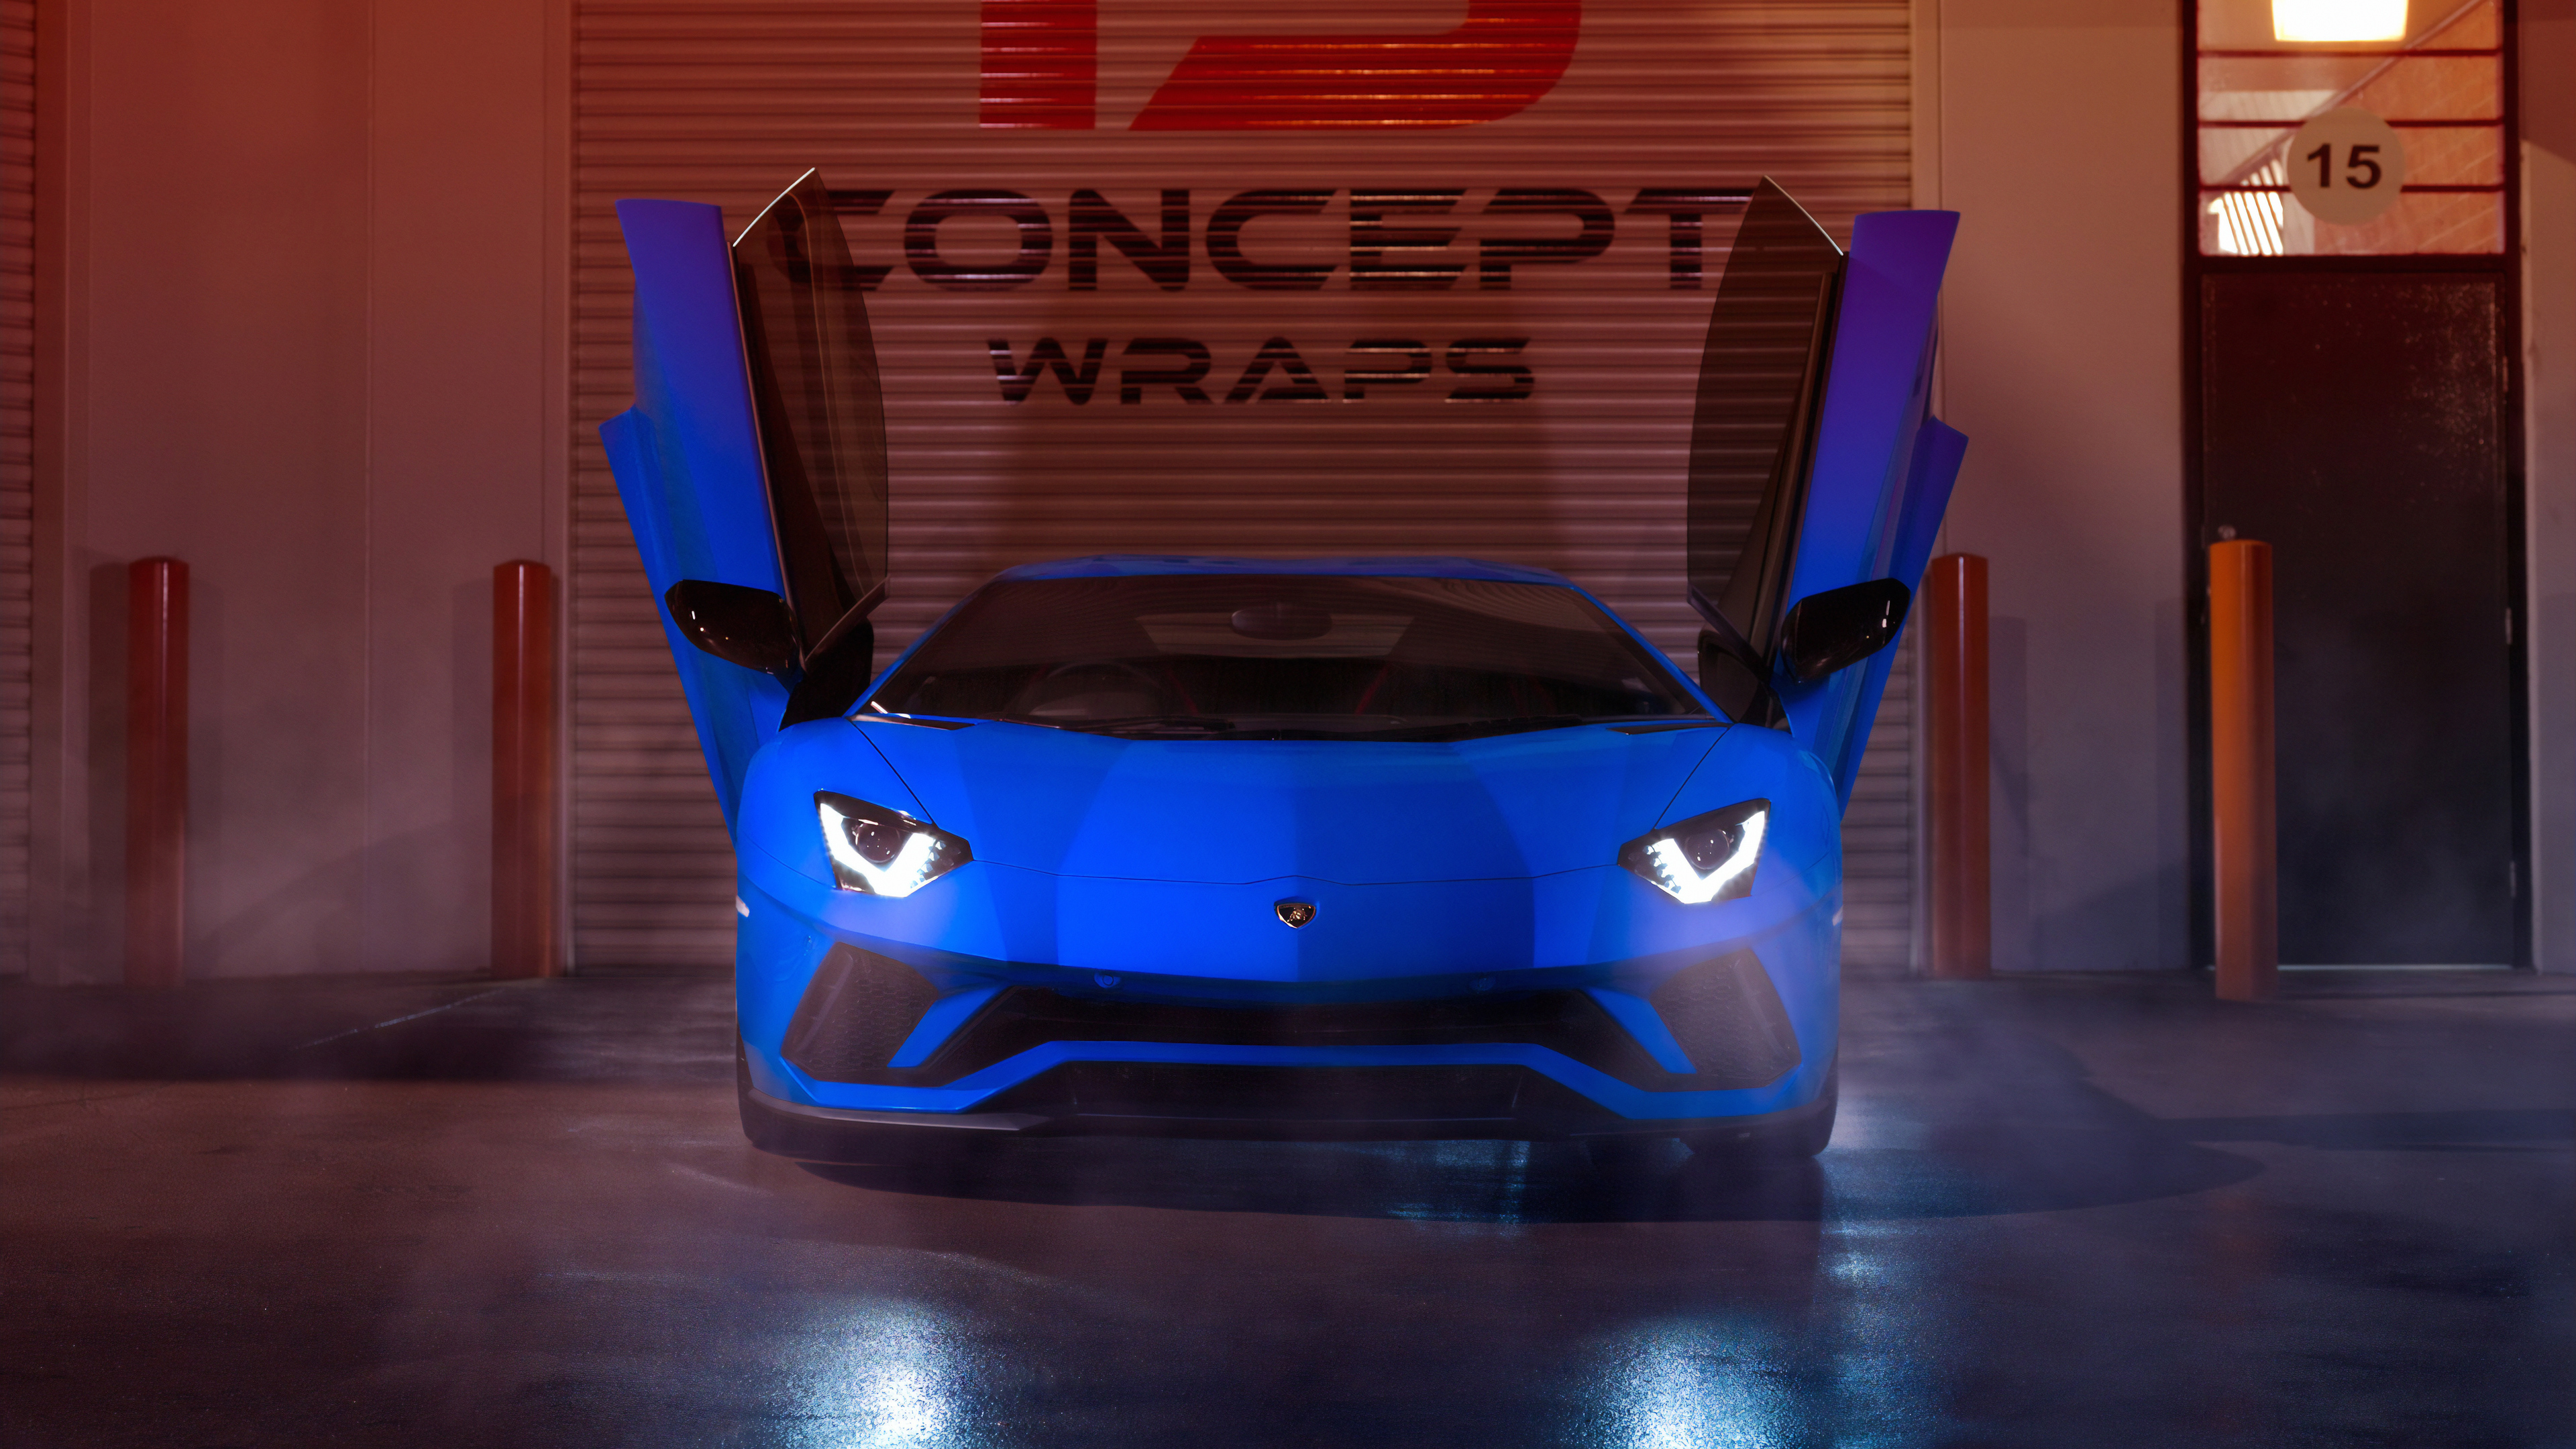 blue lamborghini aventador 2019 1569188389 - Blue Lamborghini Aventador 2019 - lamborghini wallpapers, lamborghini aventador wallpapers, hd-wallpapers, cars wallpapers, behance wallpapers, 4k-wallpapers